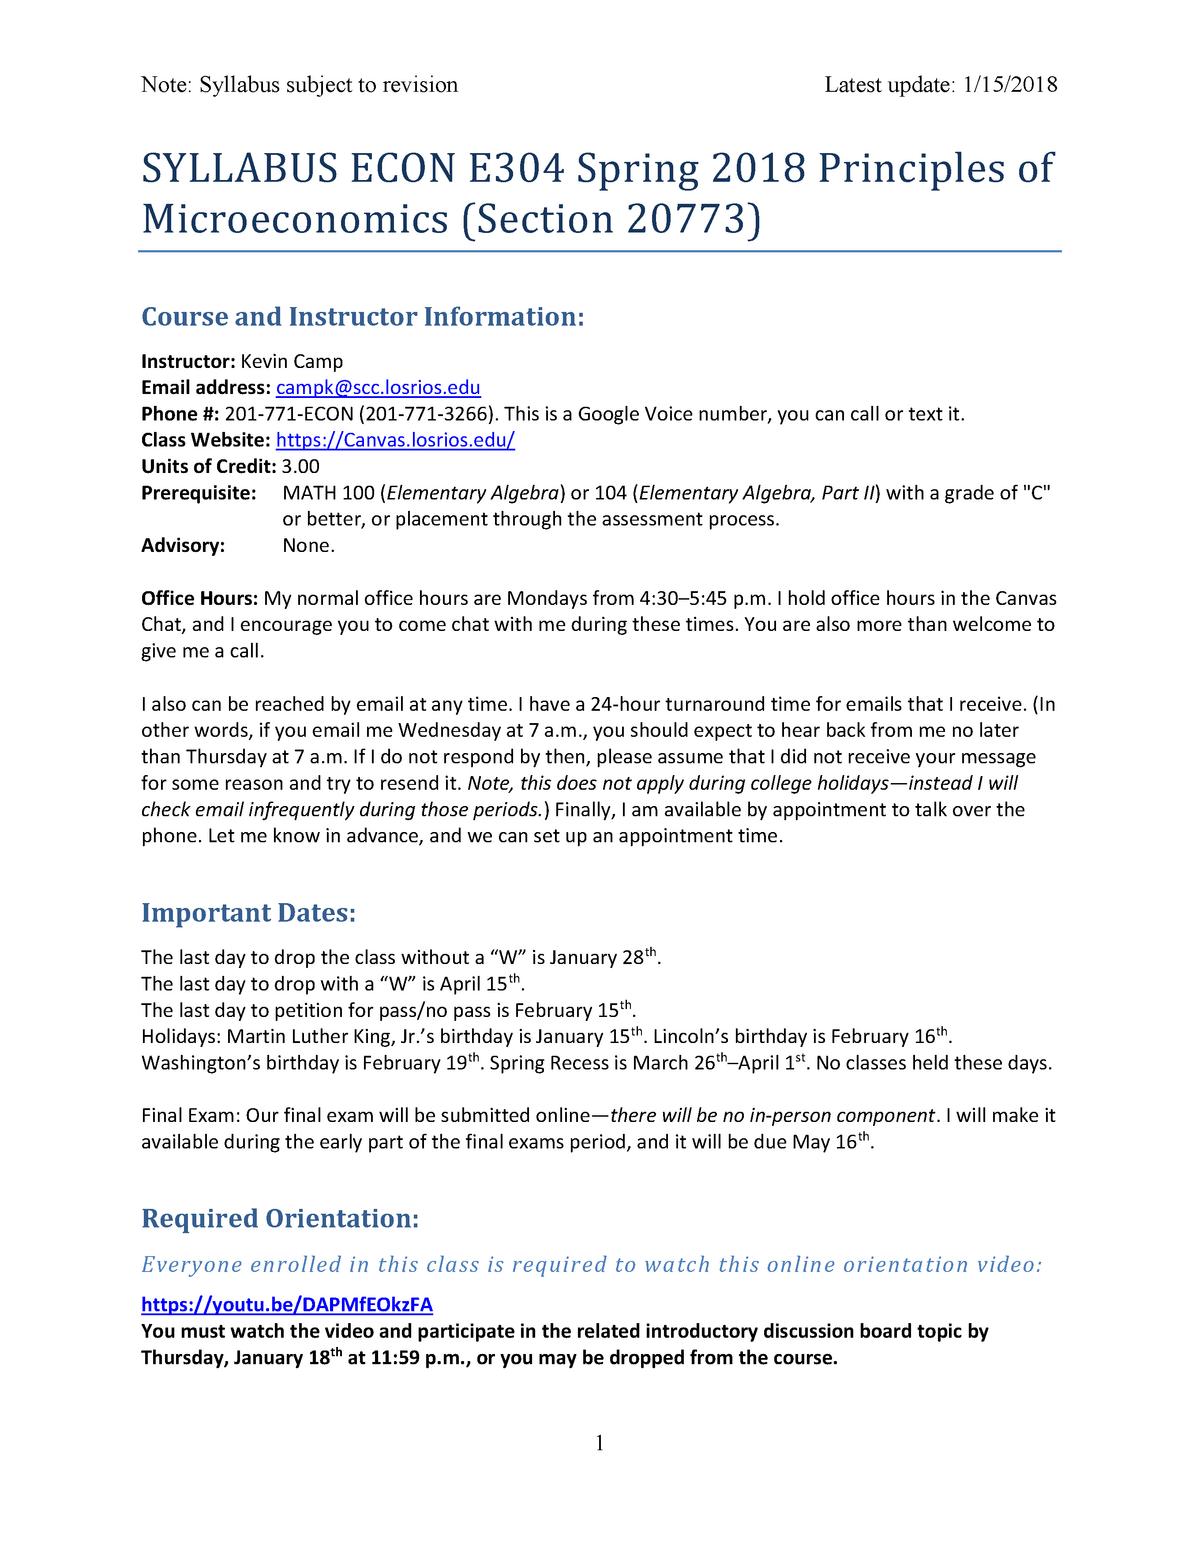 Syllabus ECON E304 Spring 2018 Principles of Microeconomics